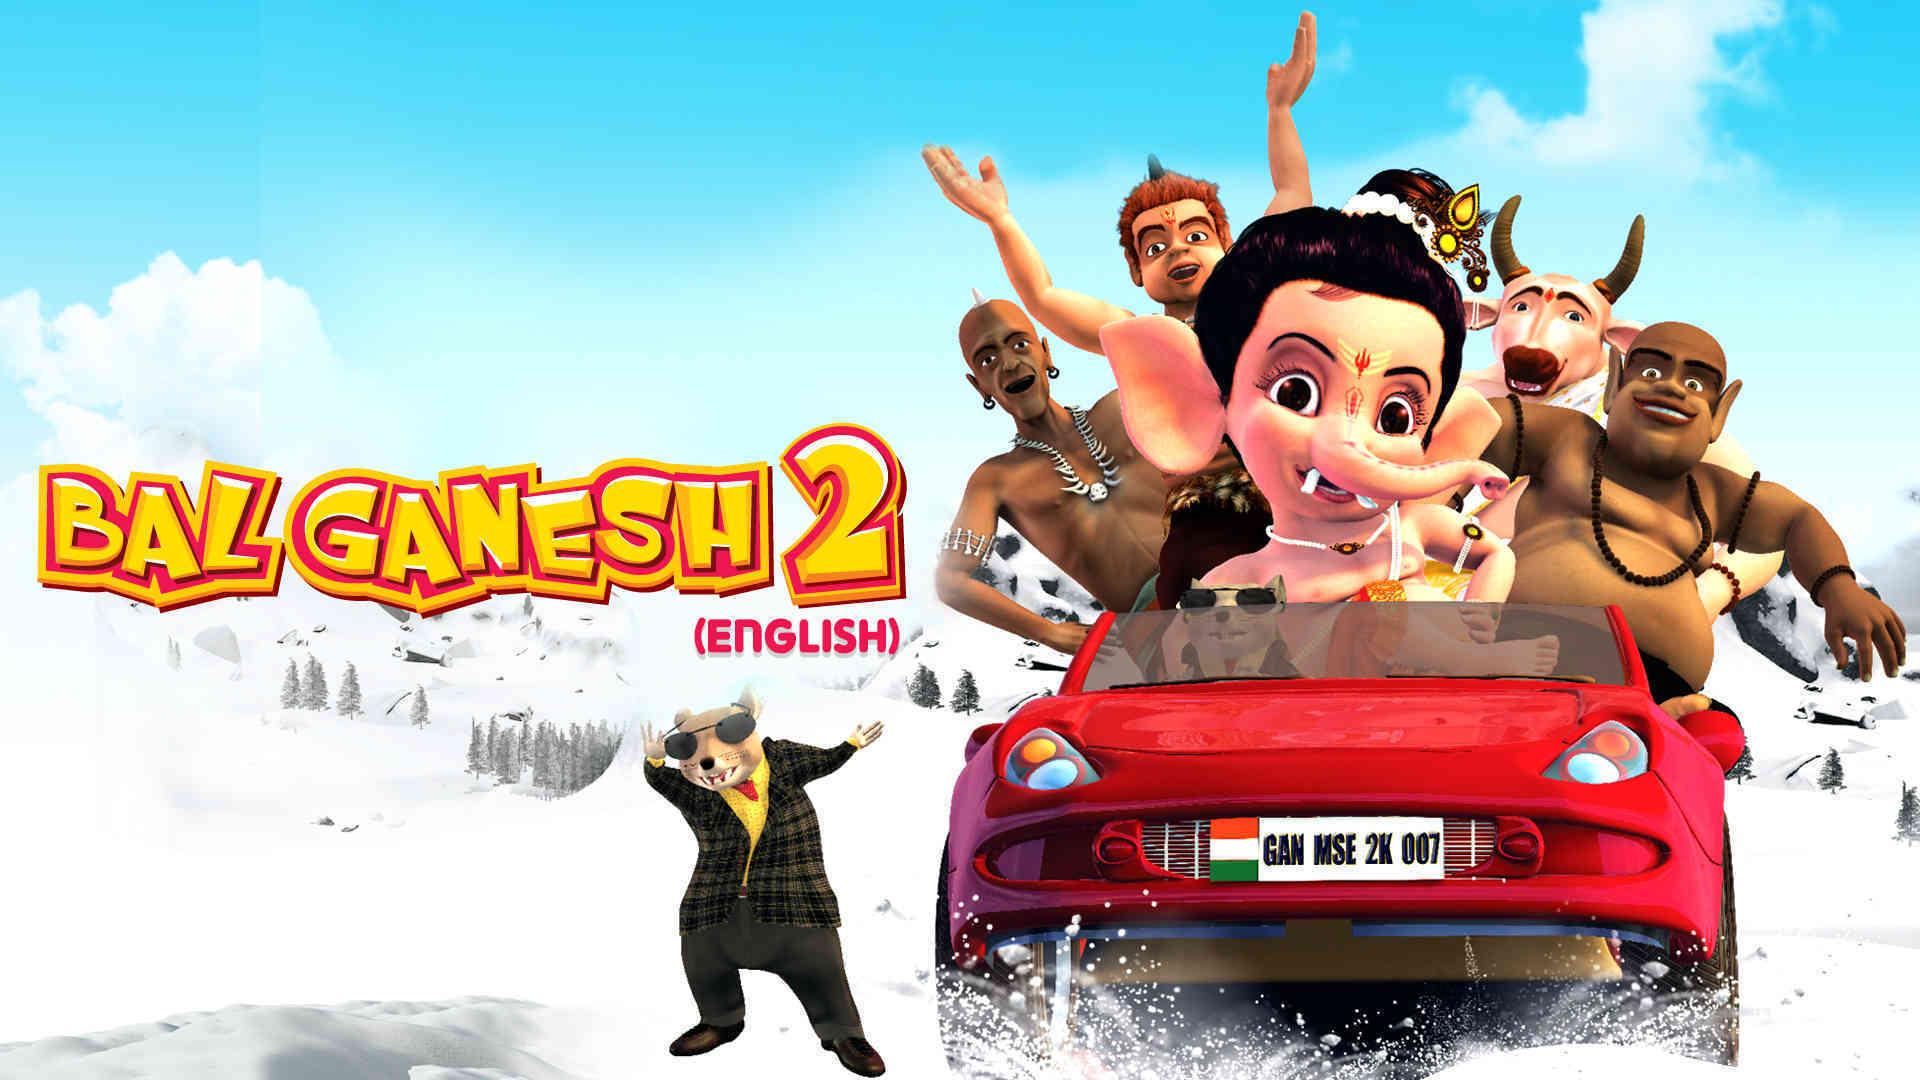 Bal Ganesh 2 - English